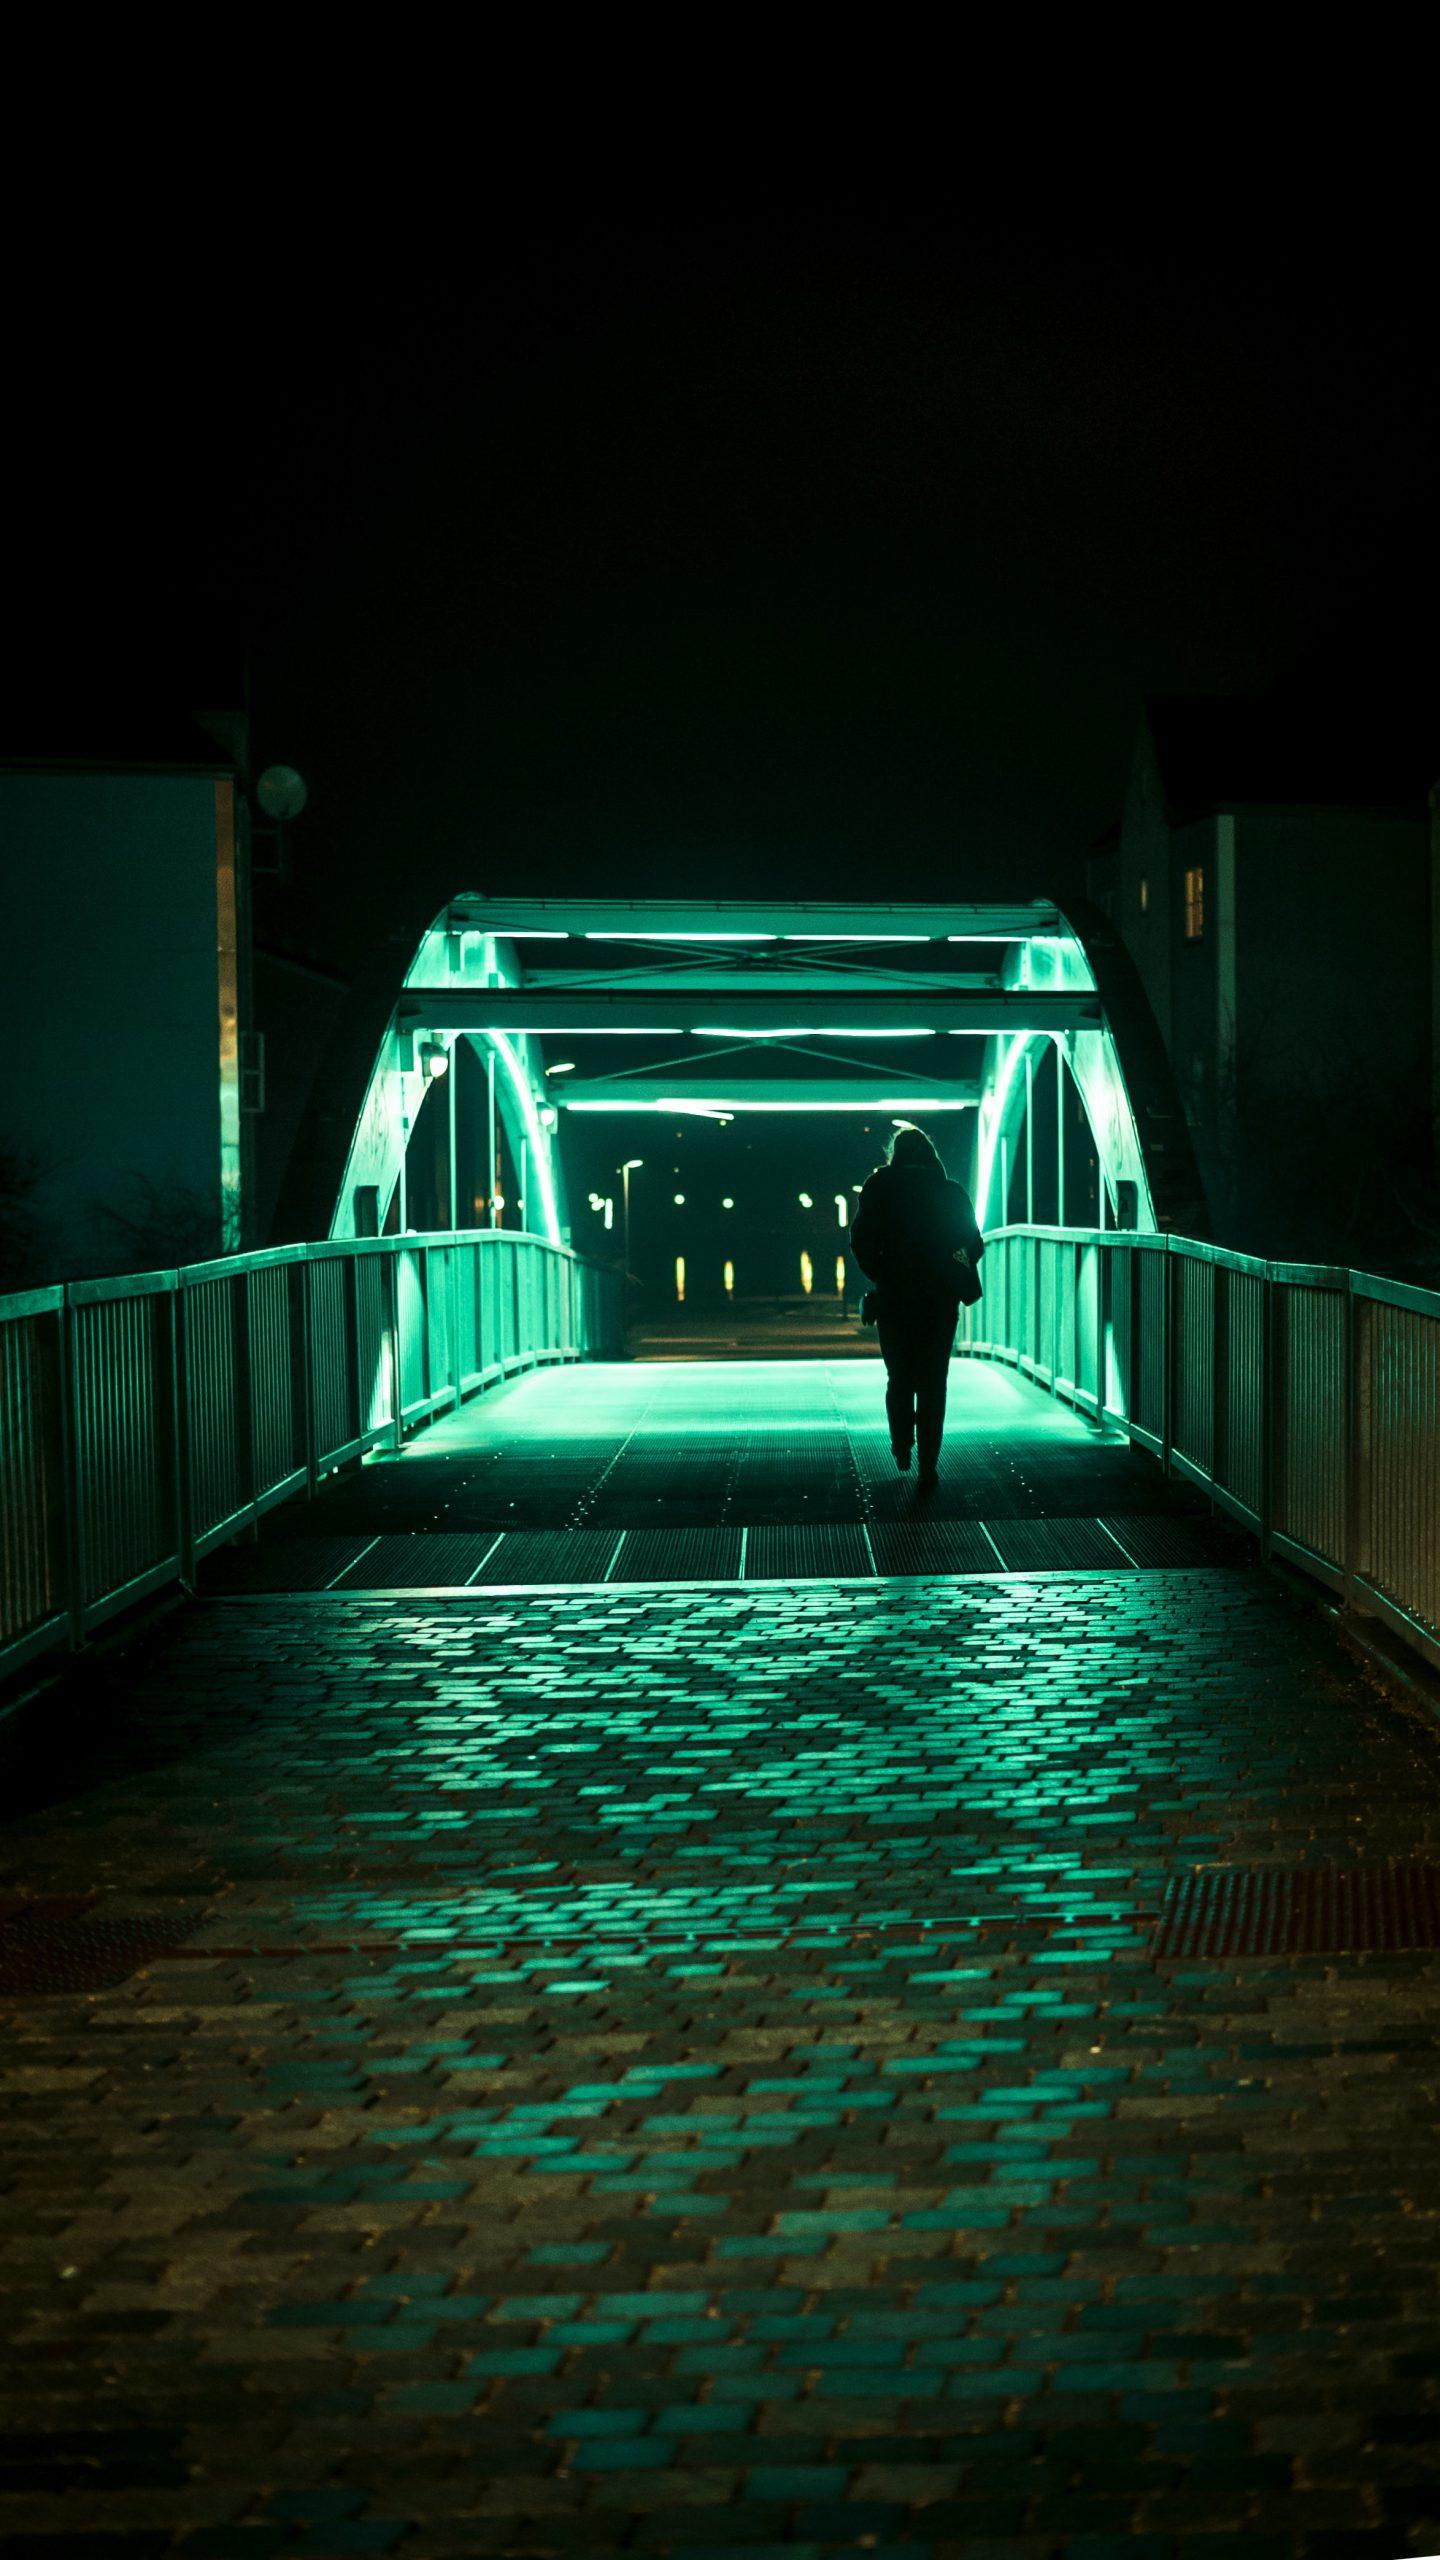 Walk Home Safe